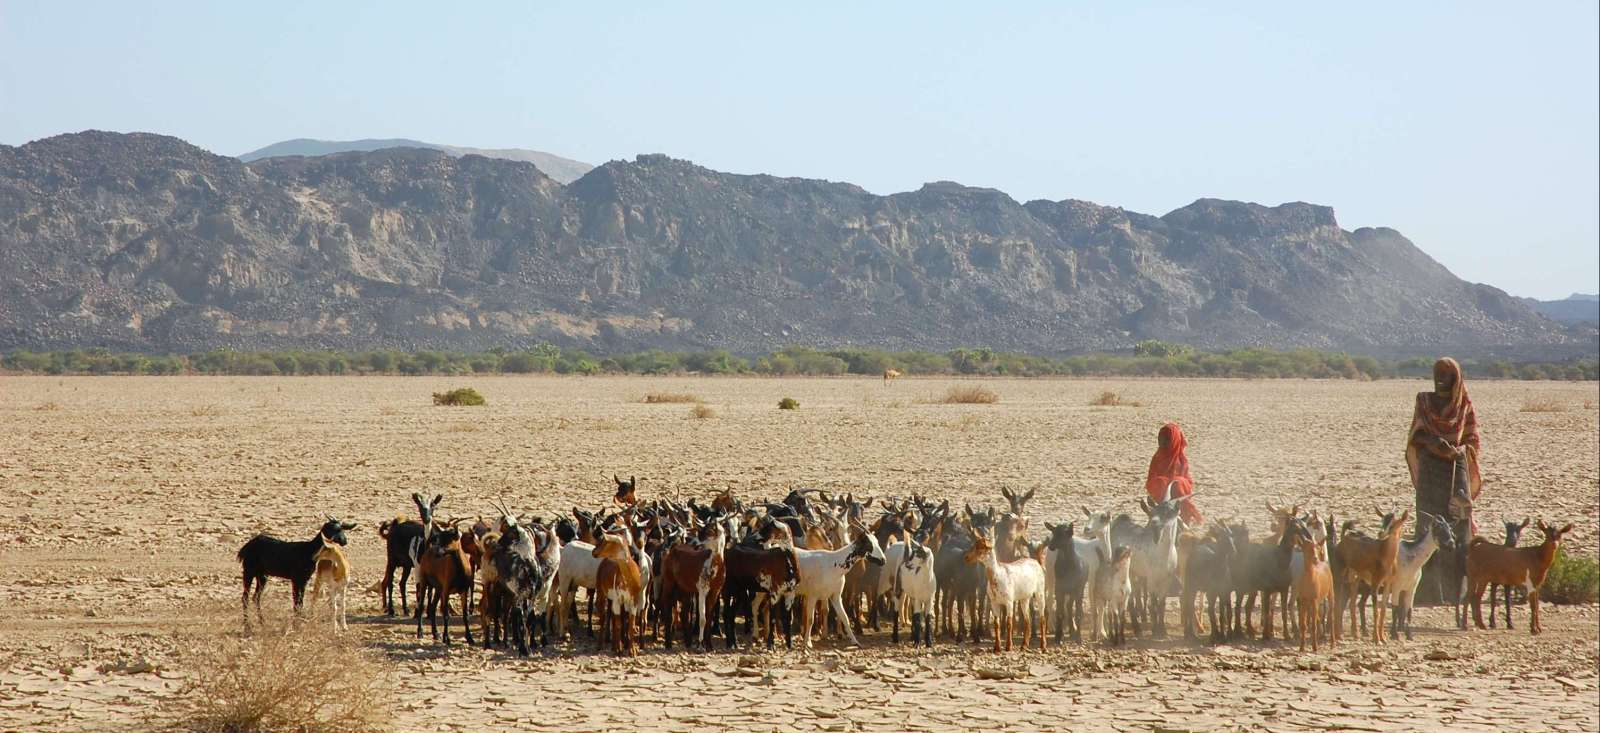 Voyage en véhicule Ethiopie : Ethiopie-Djibouti, un train pour l'aventure